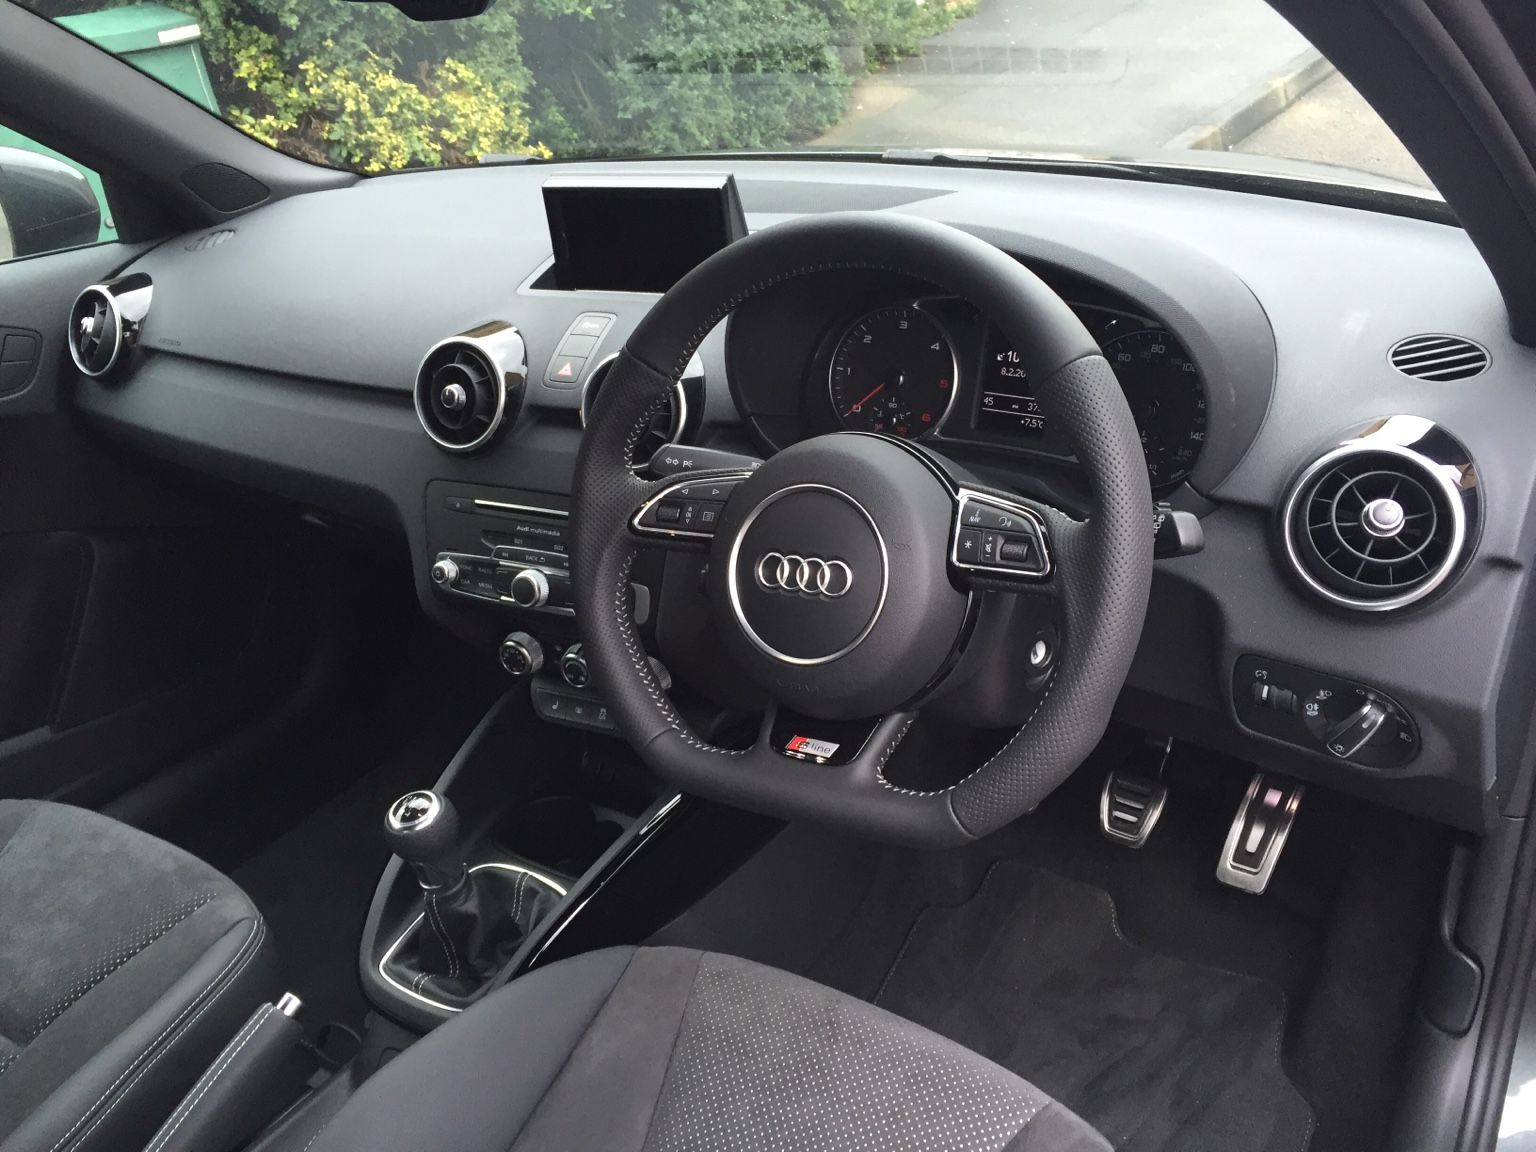 Audi a1 black edition review | auto express.